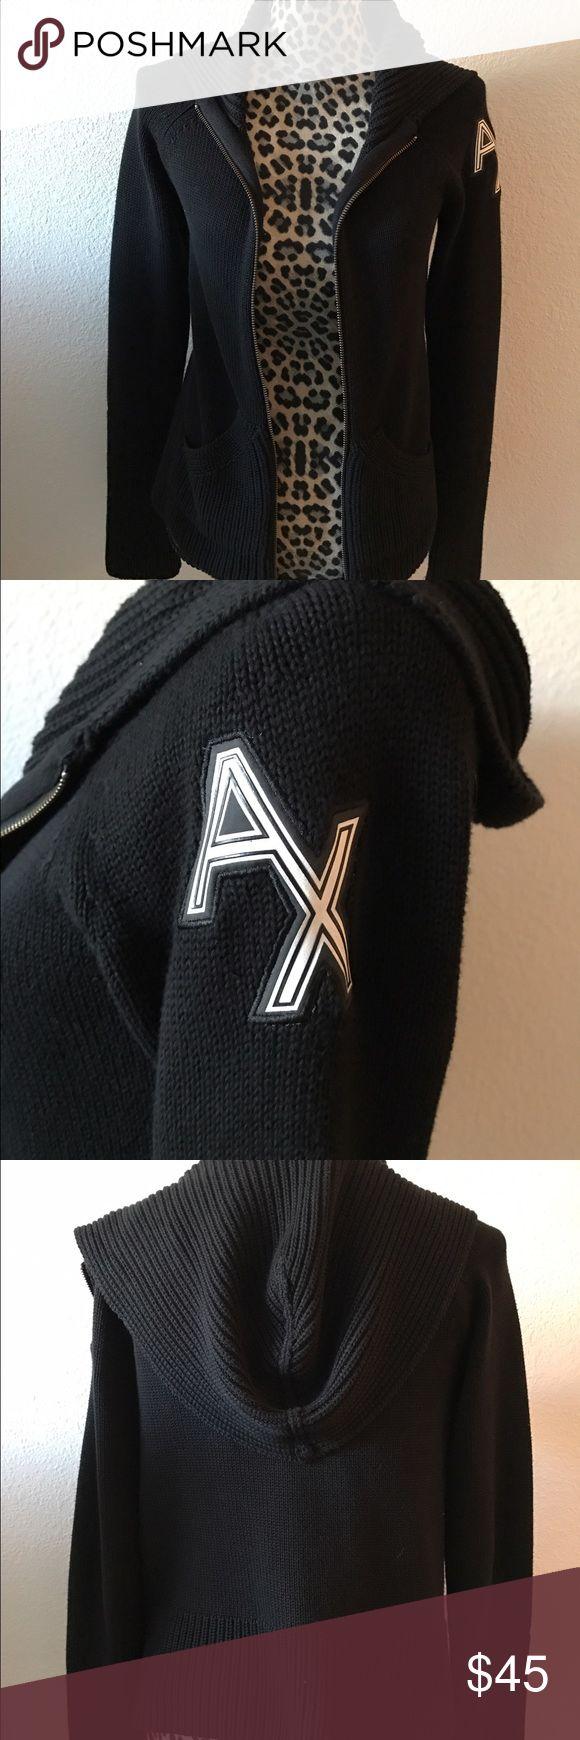 Armani Exchange Hoodie Excellent used condition Armani Exchange Hoodie in size Medium. Color is black. A/X Armani Exchange Tops Sweatshirts & Hoodies